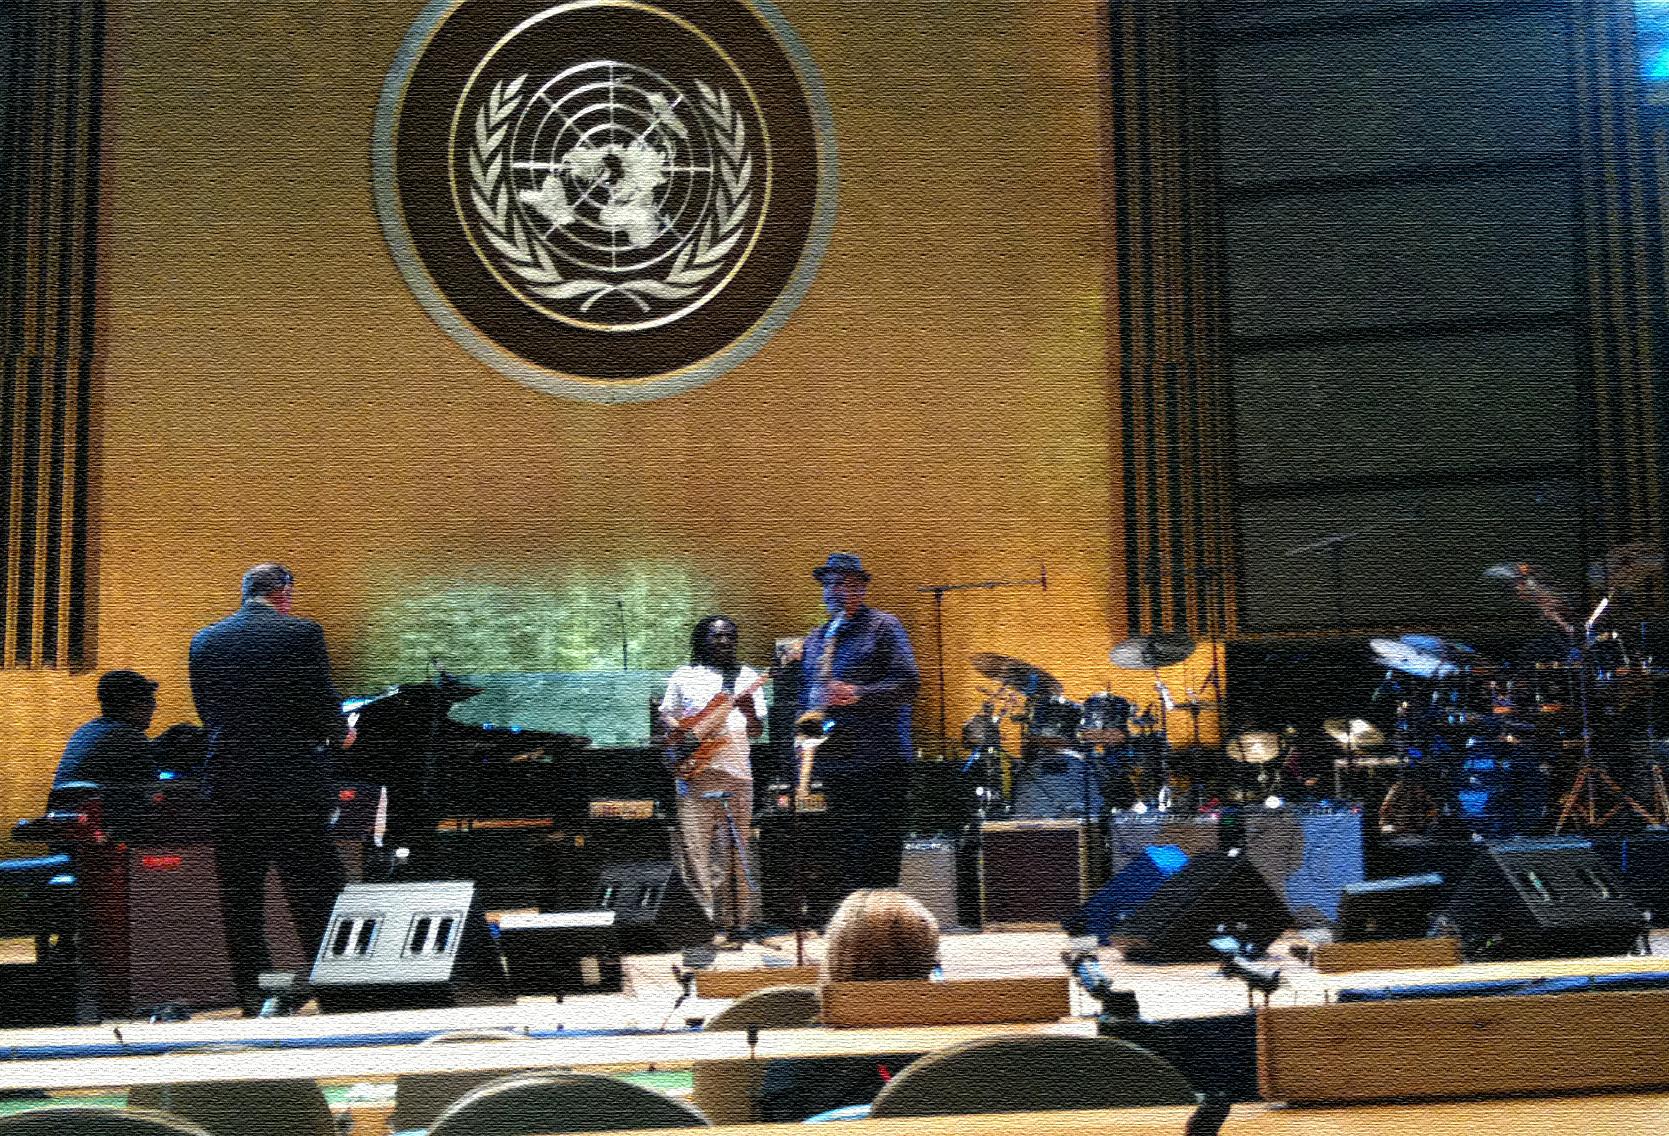 Rehearsal D. Perez, R. Bona, J. Lovano & J. DeJohnette Photo by Tarek Yamani